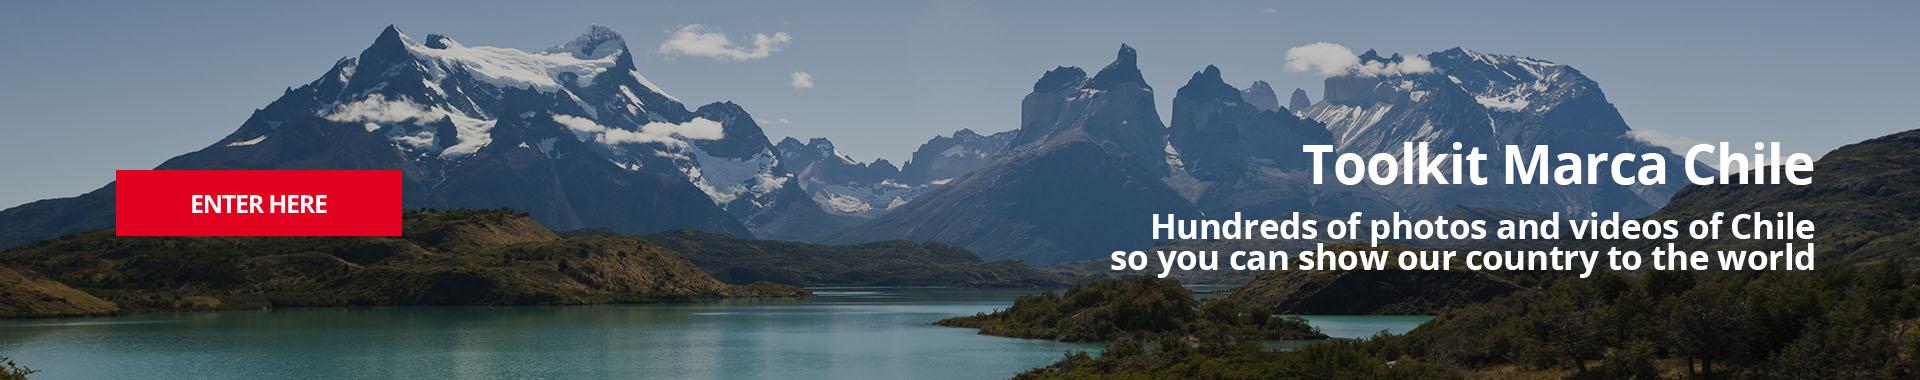 banner-chile-toolkit-videos-imagenes.jpg